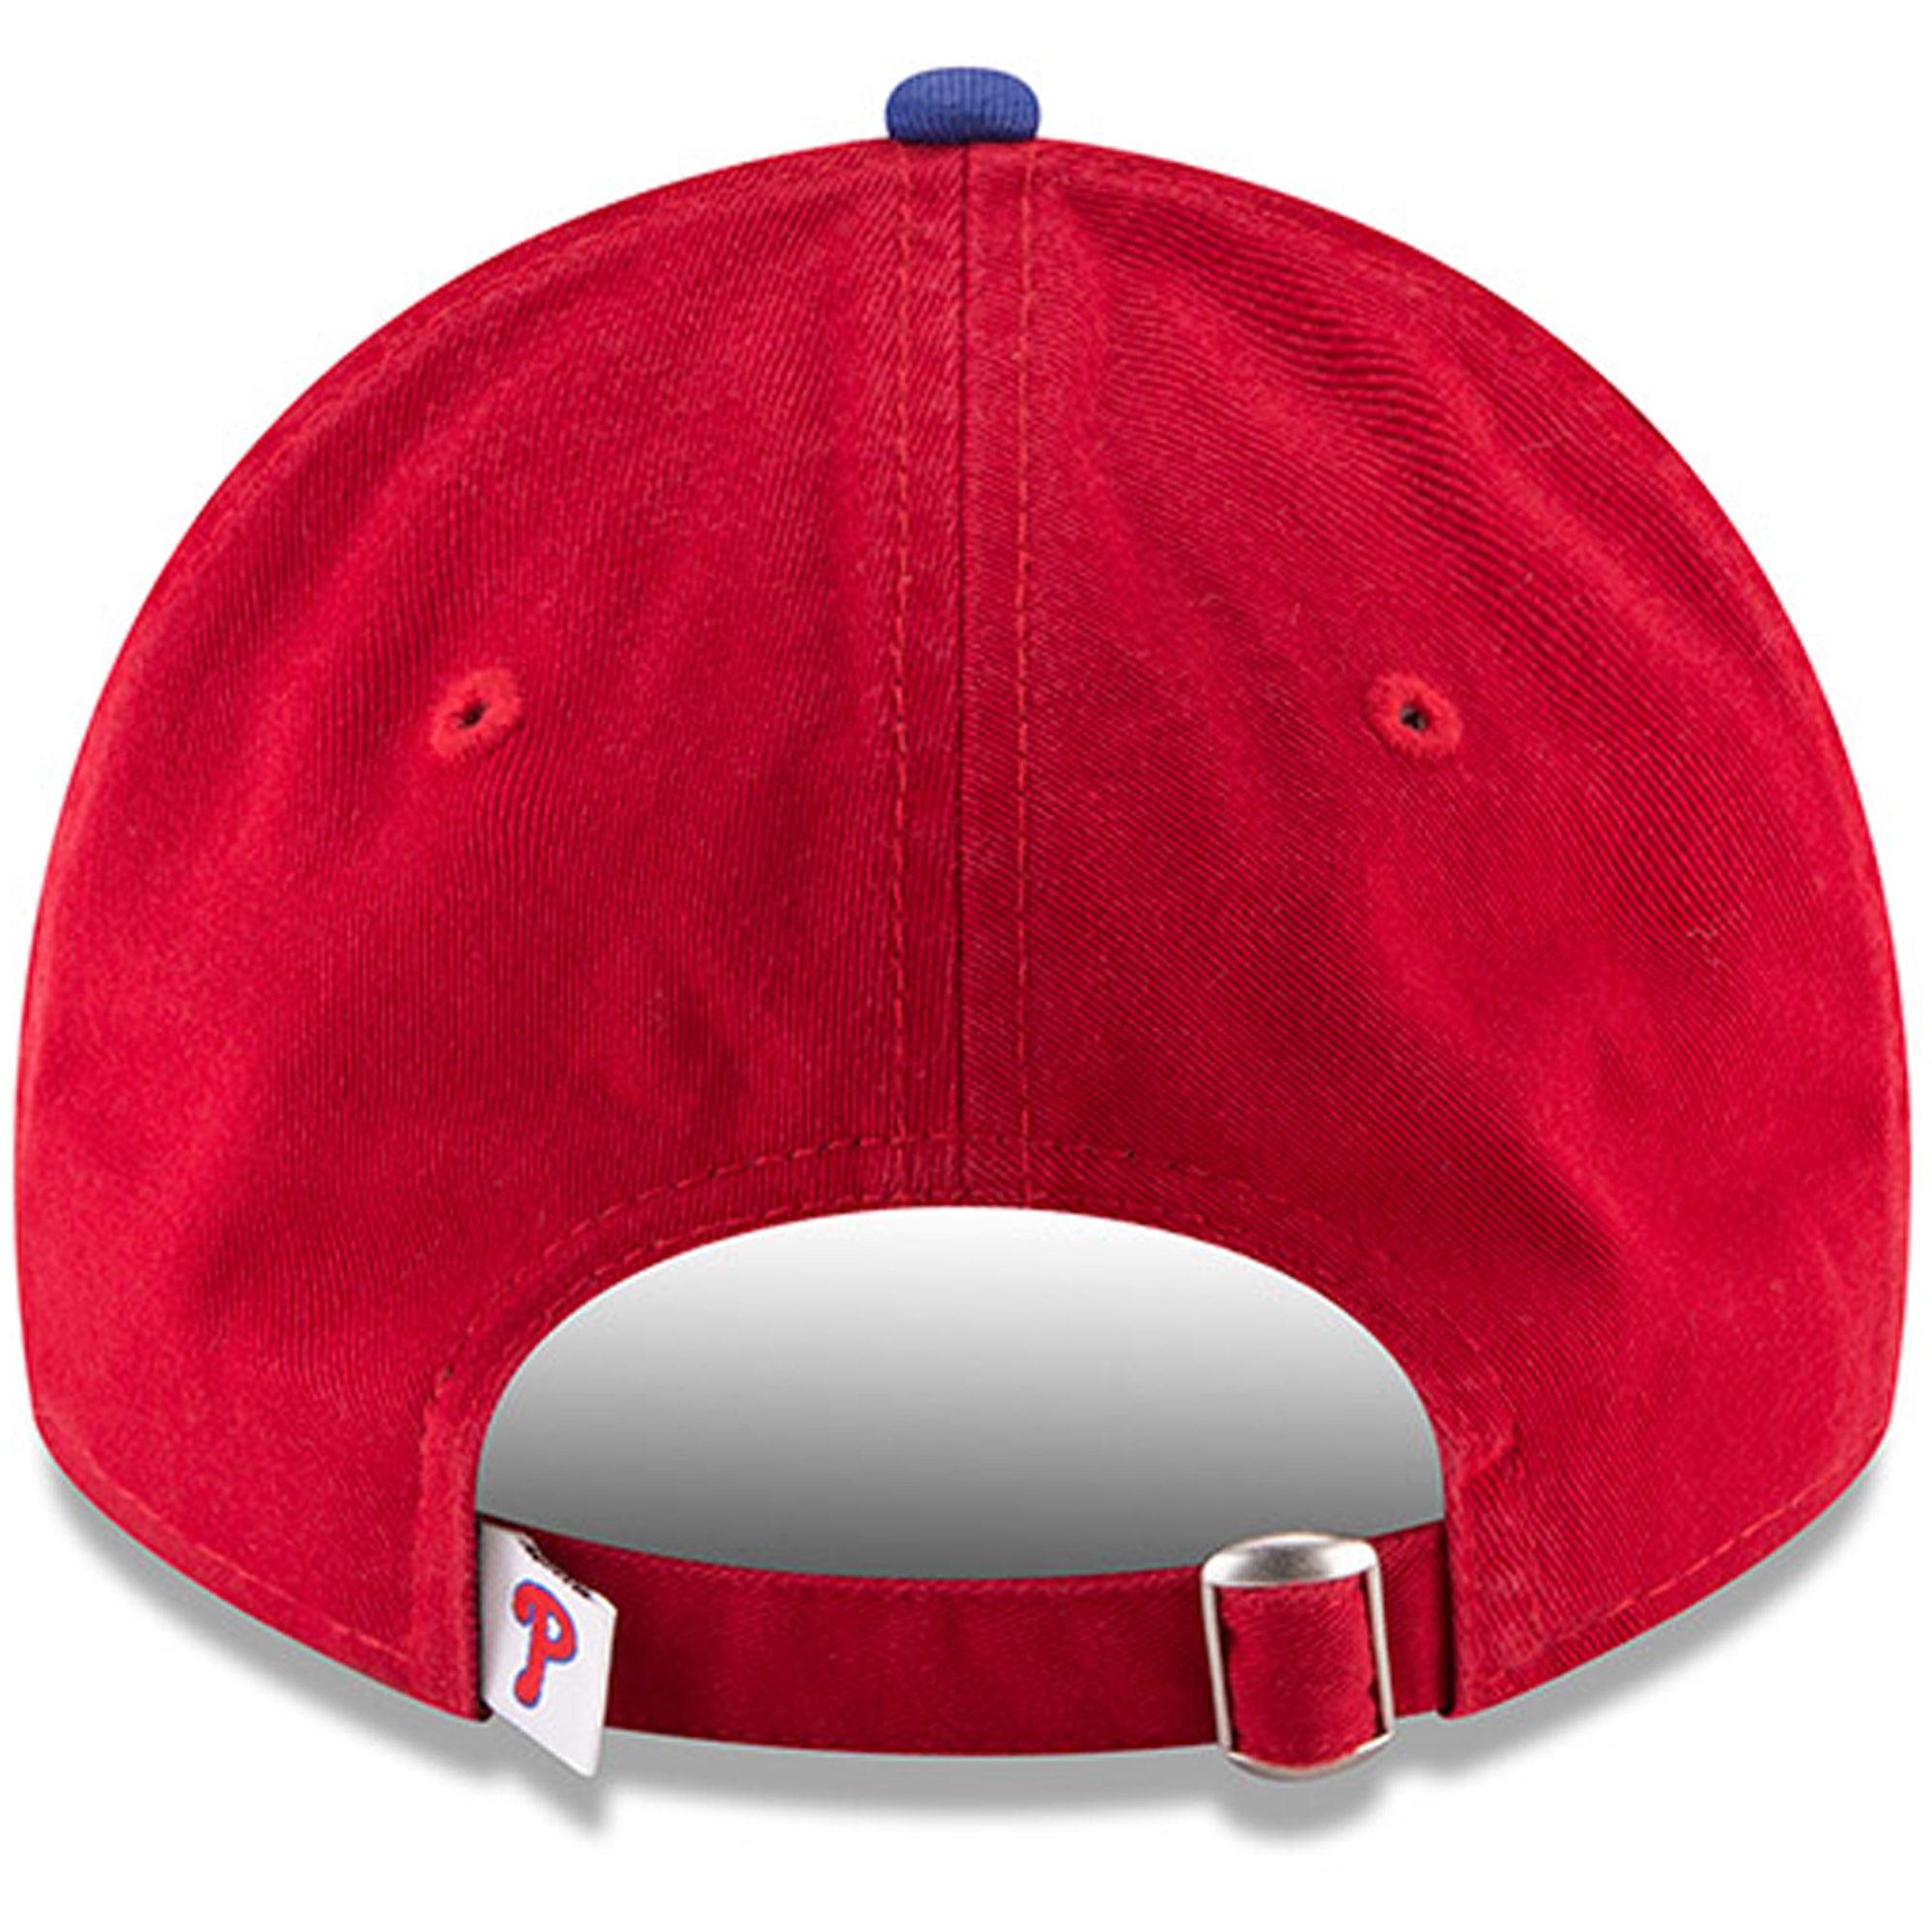 hot sale online f716b 9c82b Philadelphia Phillies New Era Game Replica Core Classic 9TWENTY Adjustable  Hat - Red - OSFA - Walmart.com